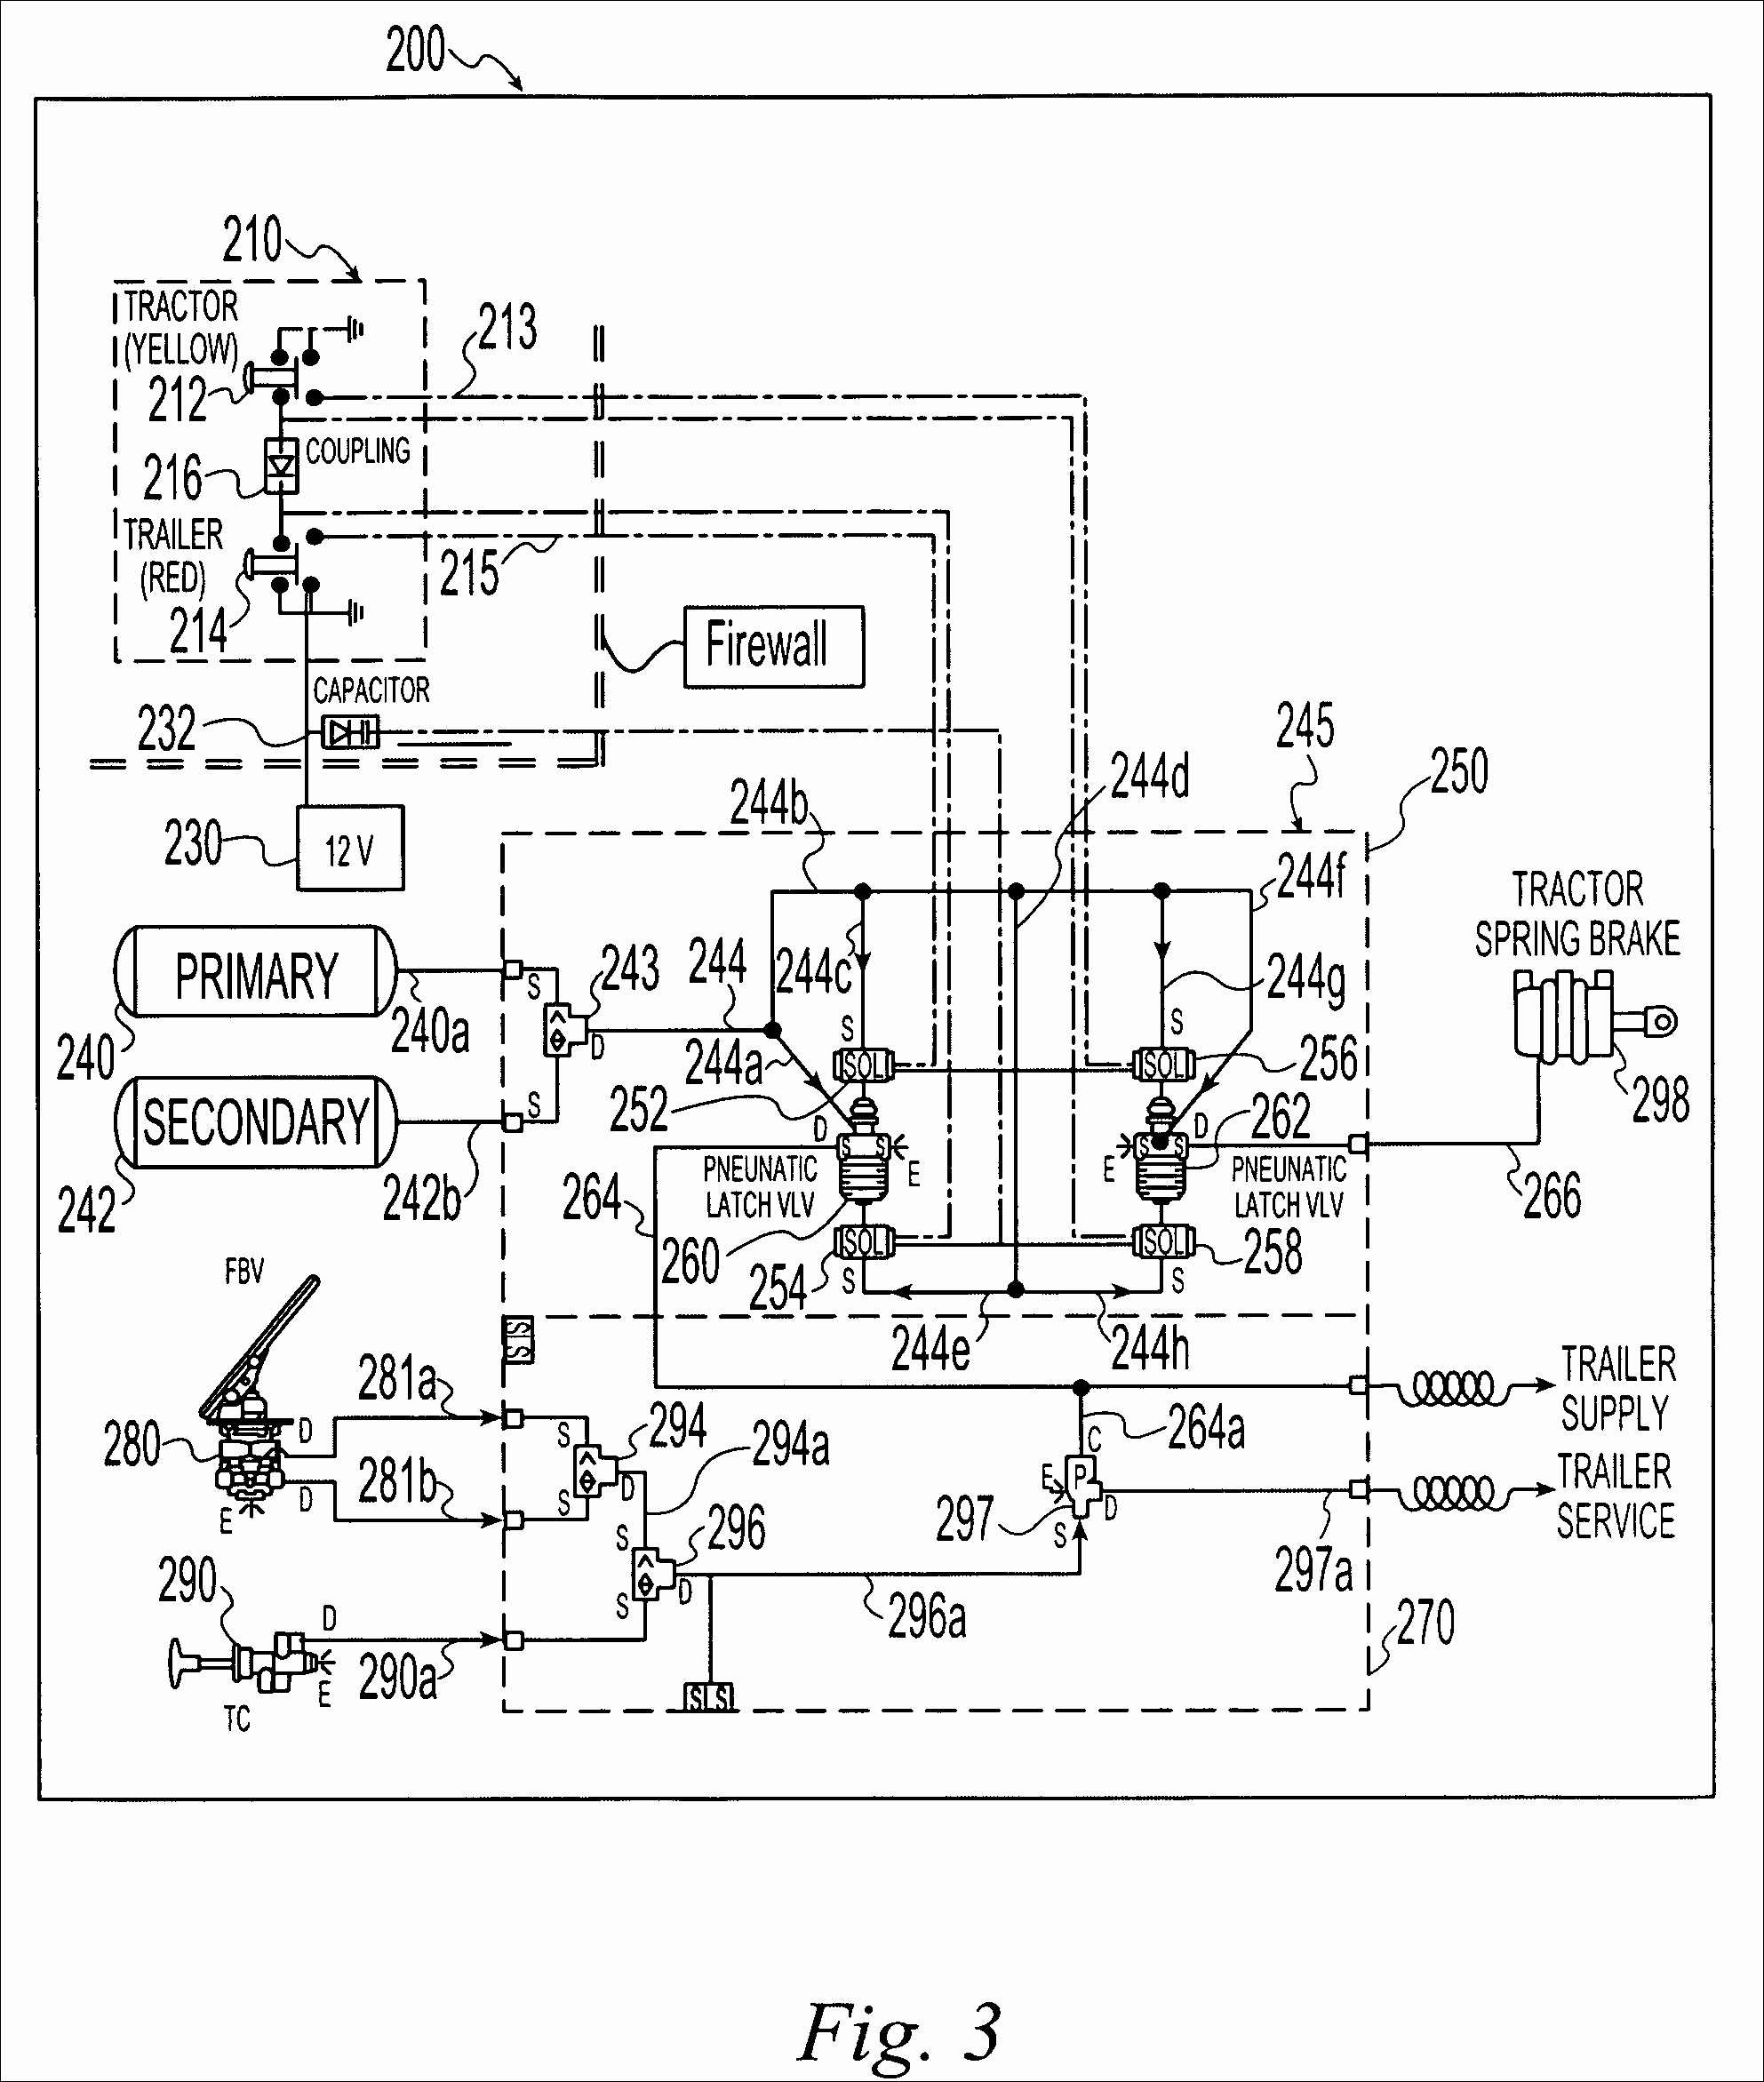 1997 Chevy 1500 Trailer Wiring Diagram